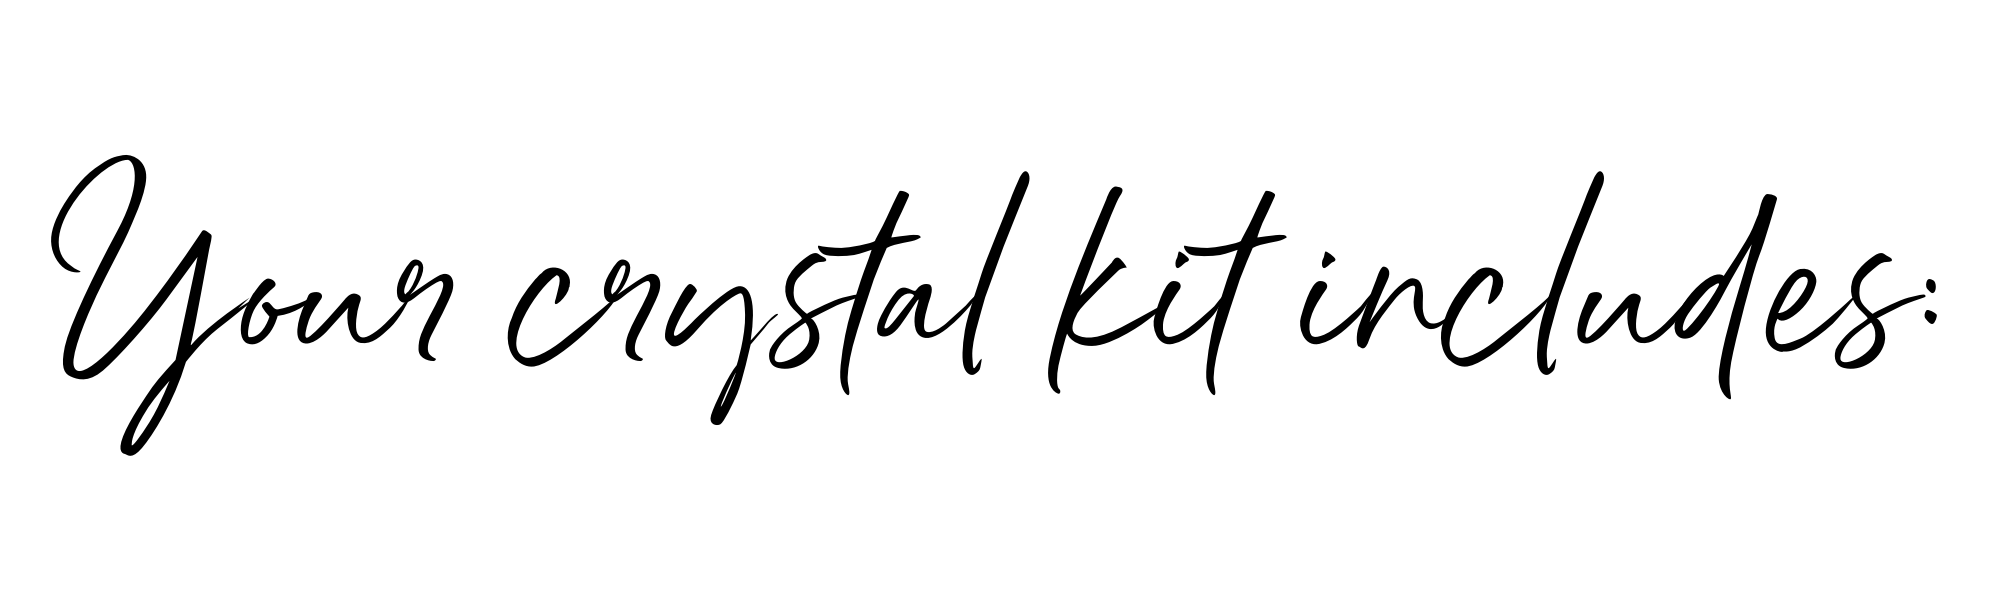 Copy of Rose Quartz - white (20)